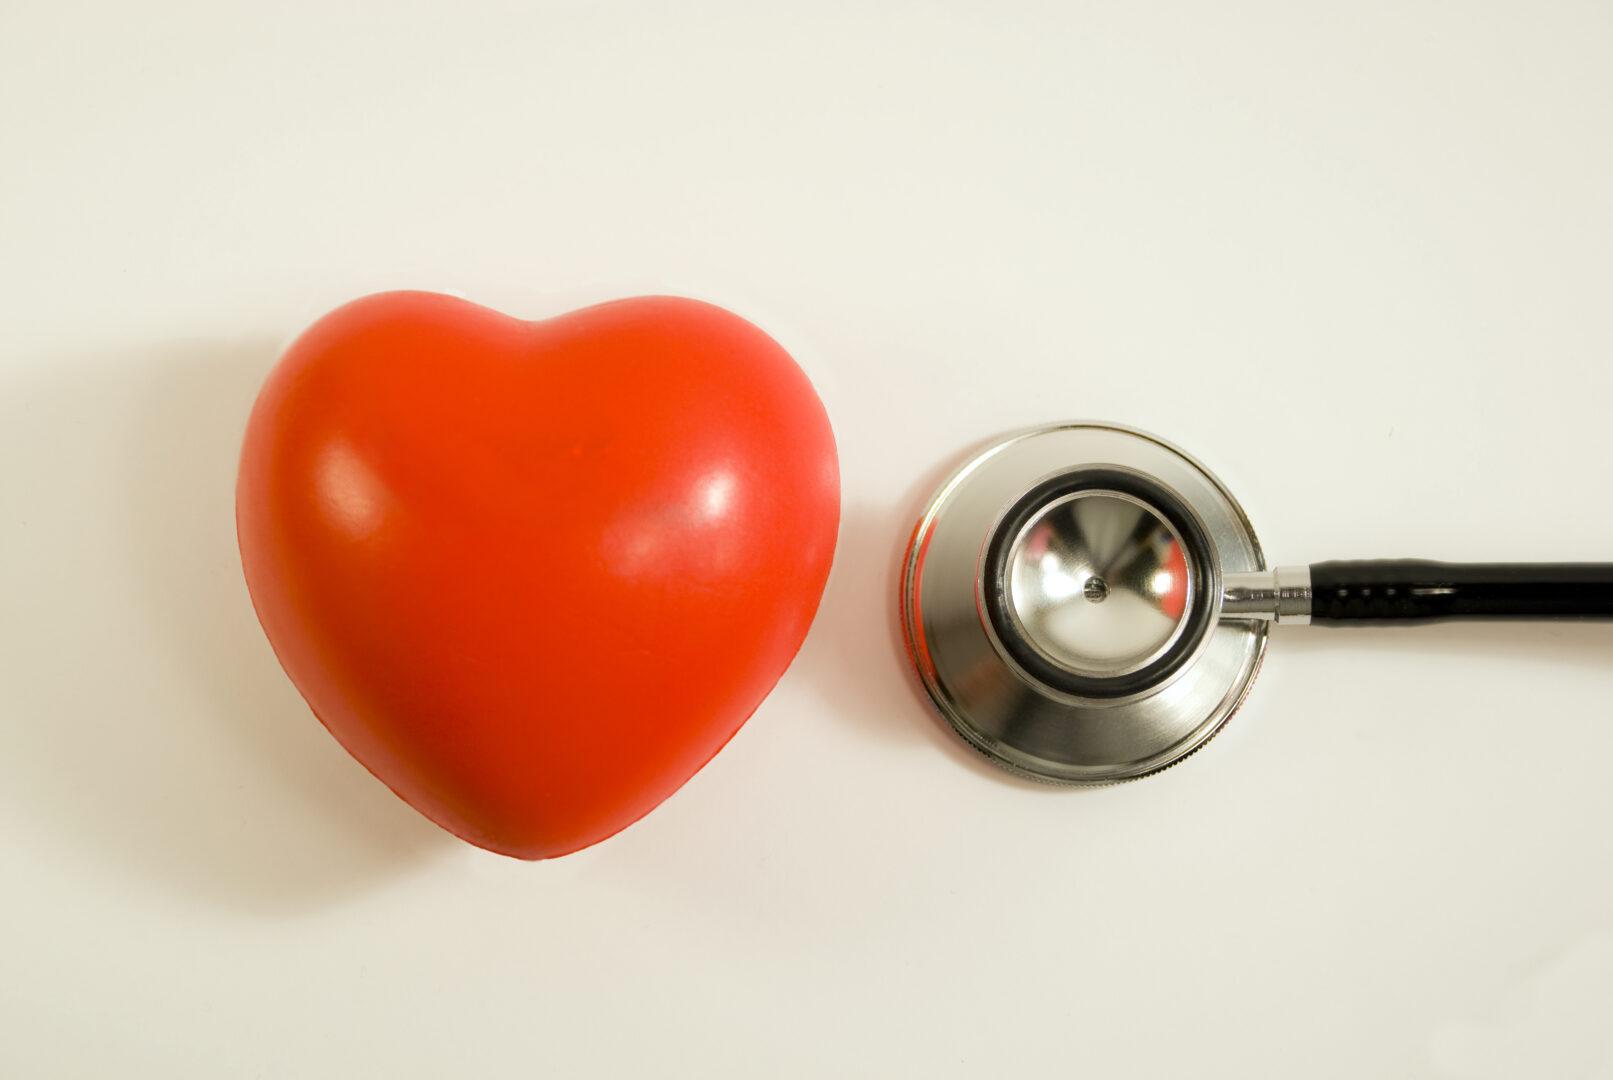 Mide tu edad cardiovascular, gratuitamente.